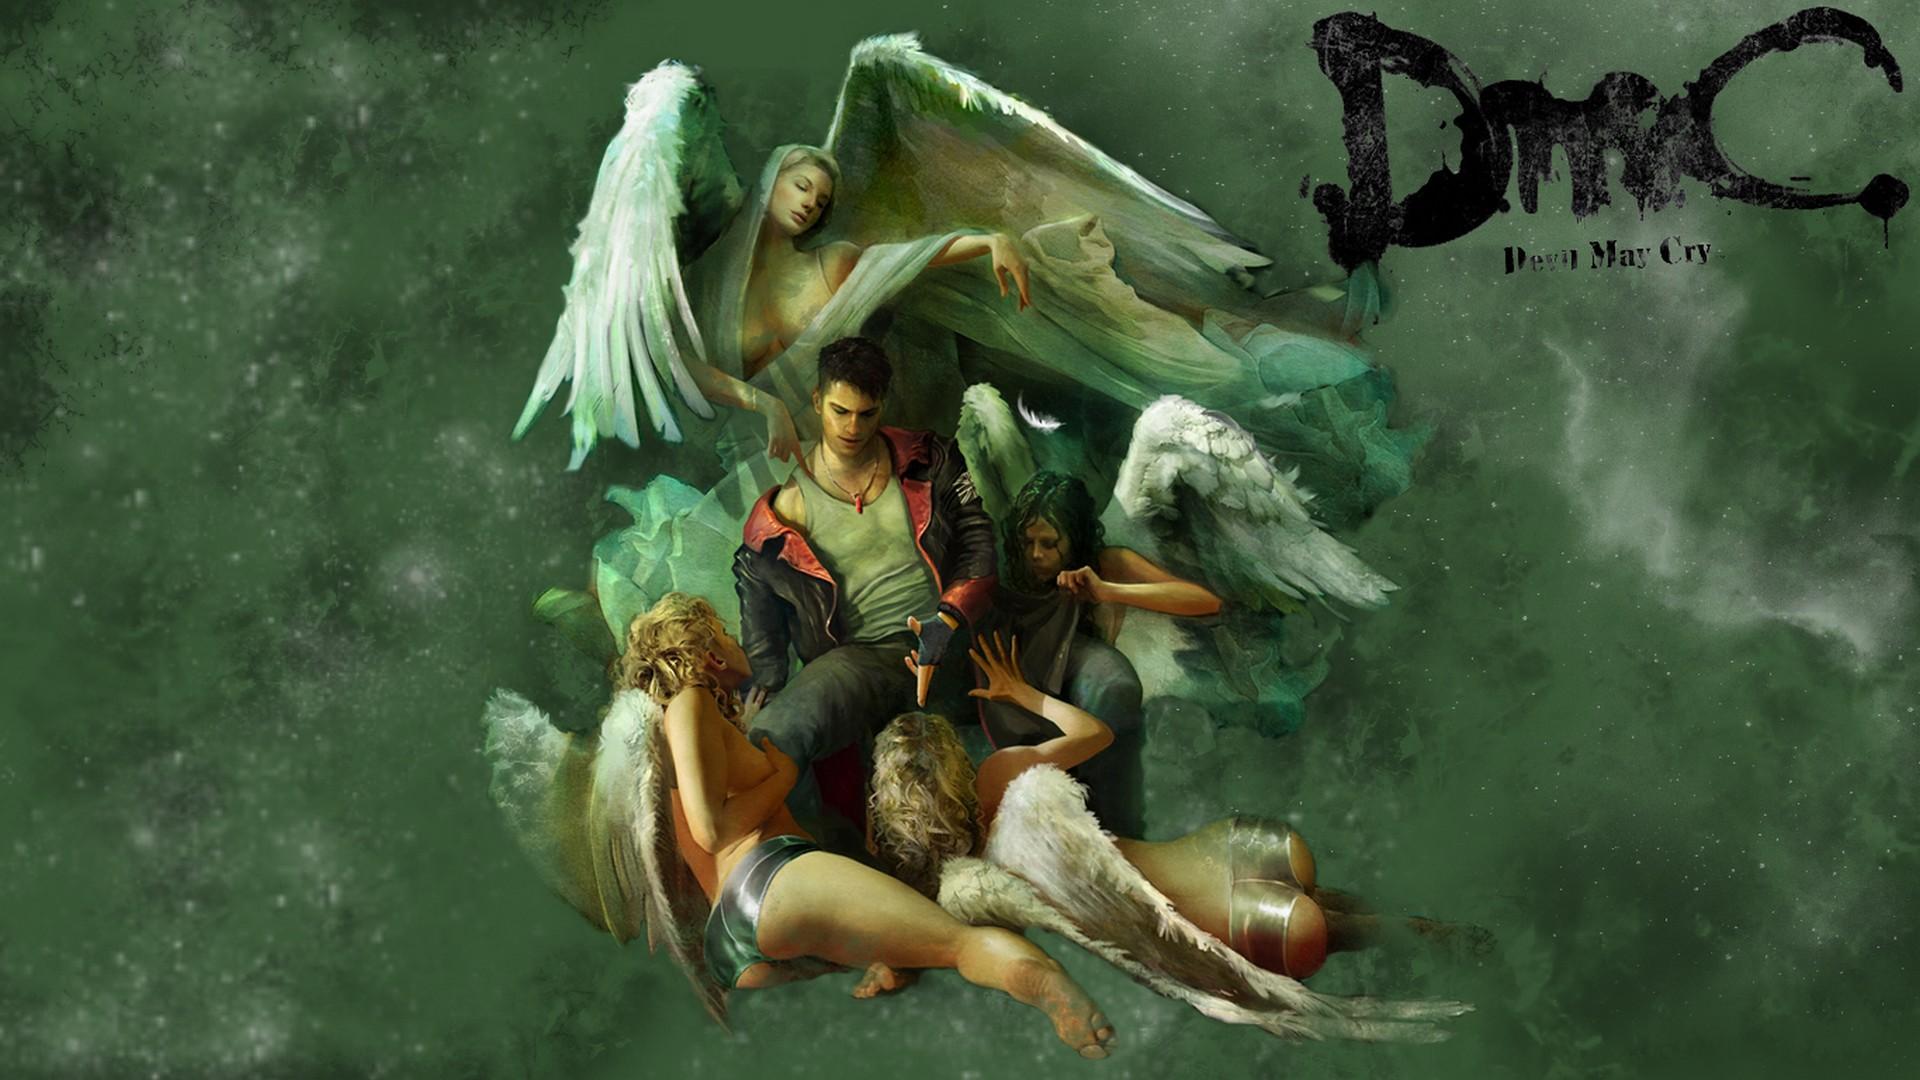 DmC 4